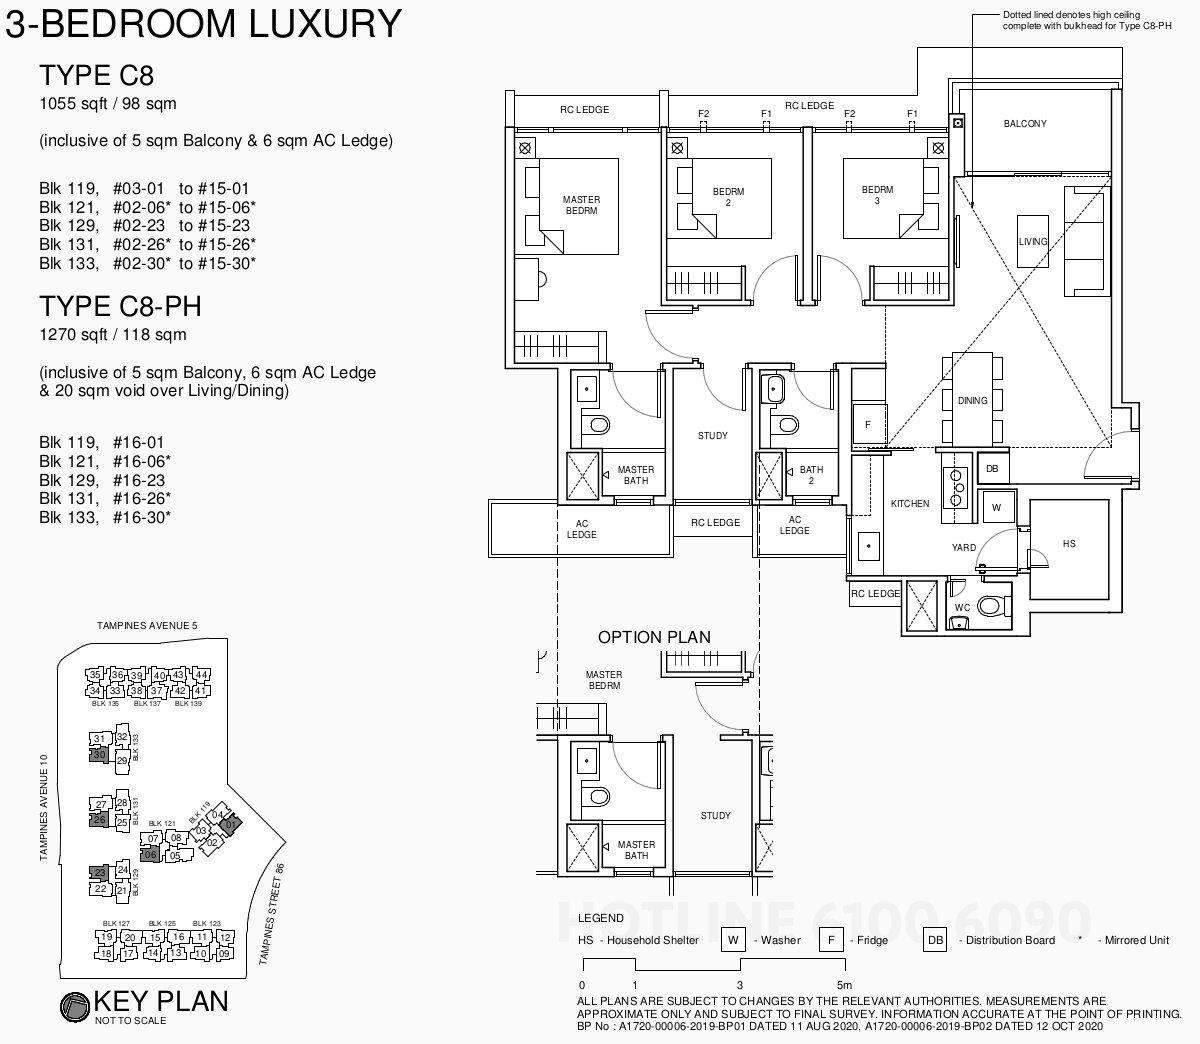 Parc Central Residences Floor Plan . 3BR Luxury Type C8